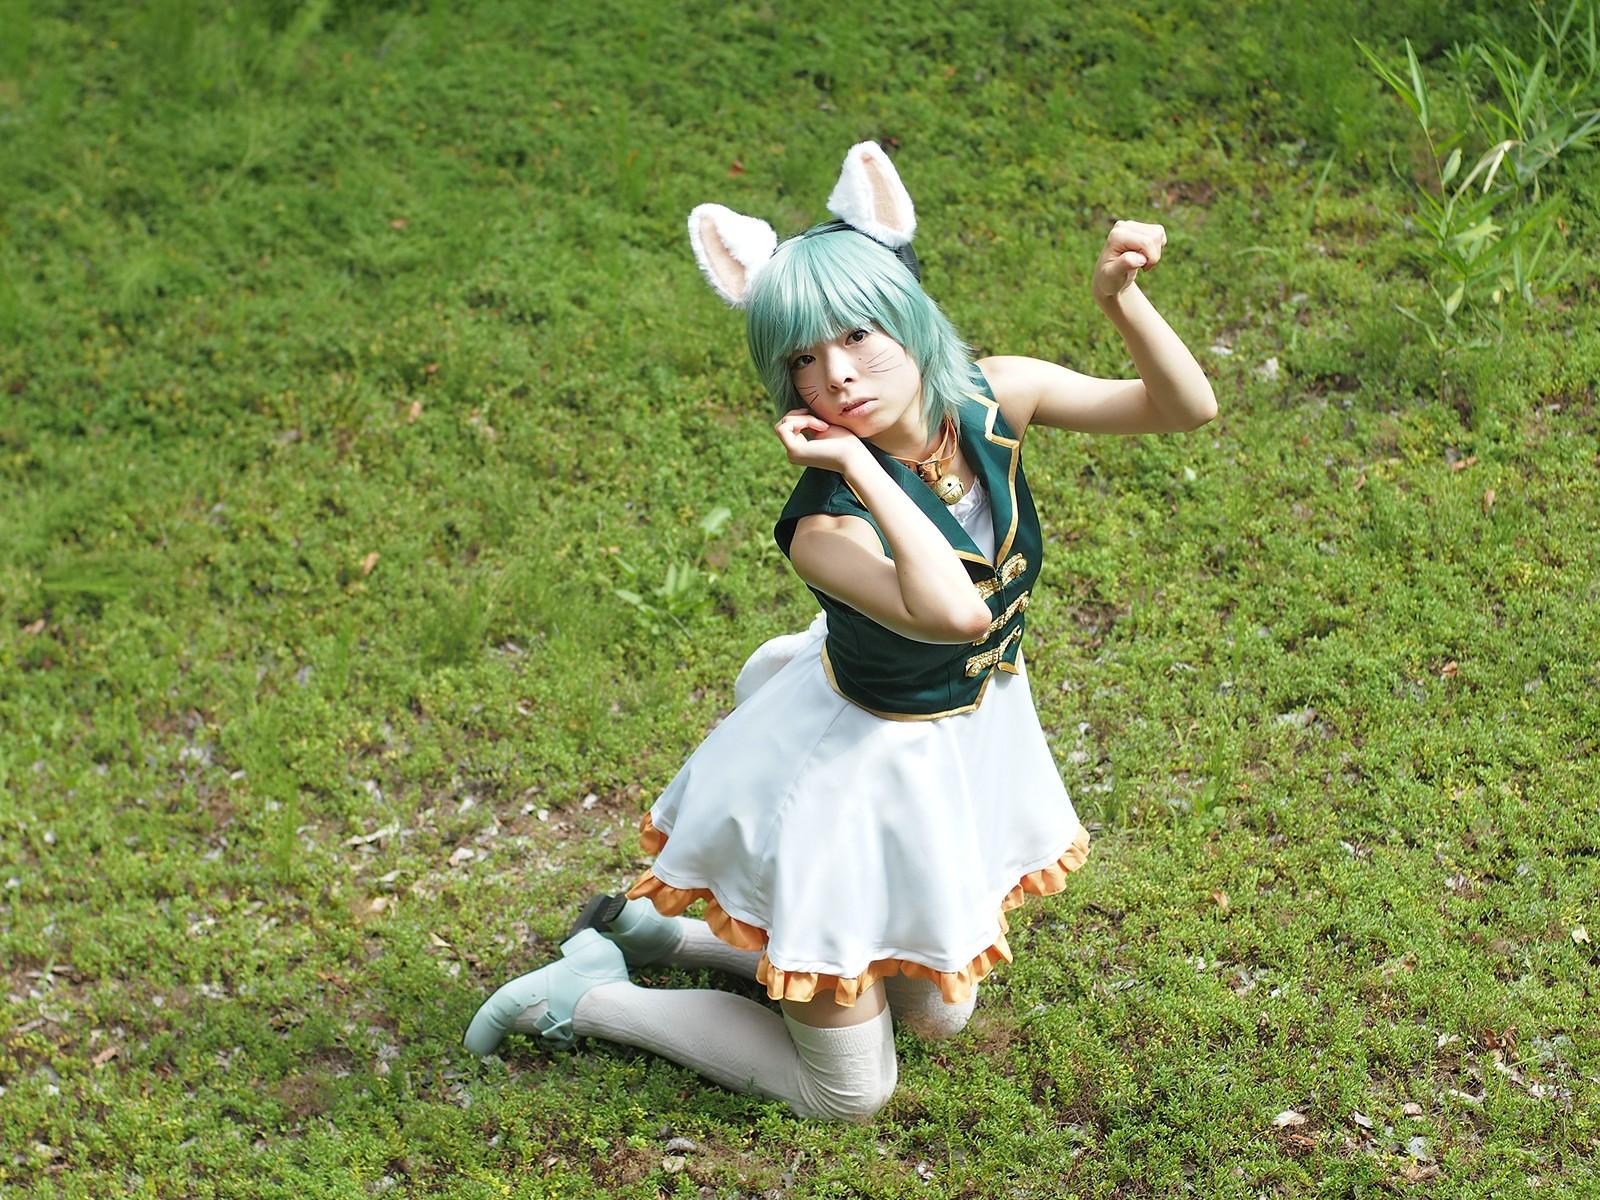 Vocaloid GUMI 嗚呼素晴らしきニャン生ver